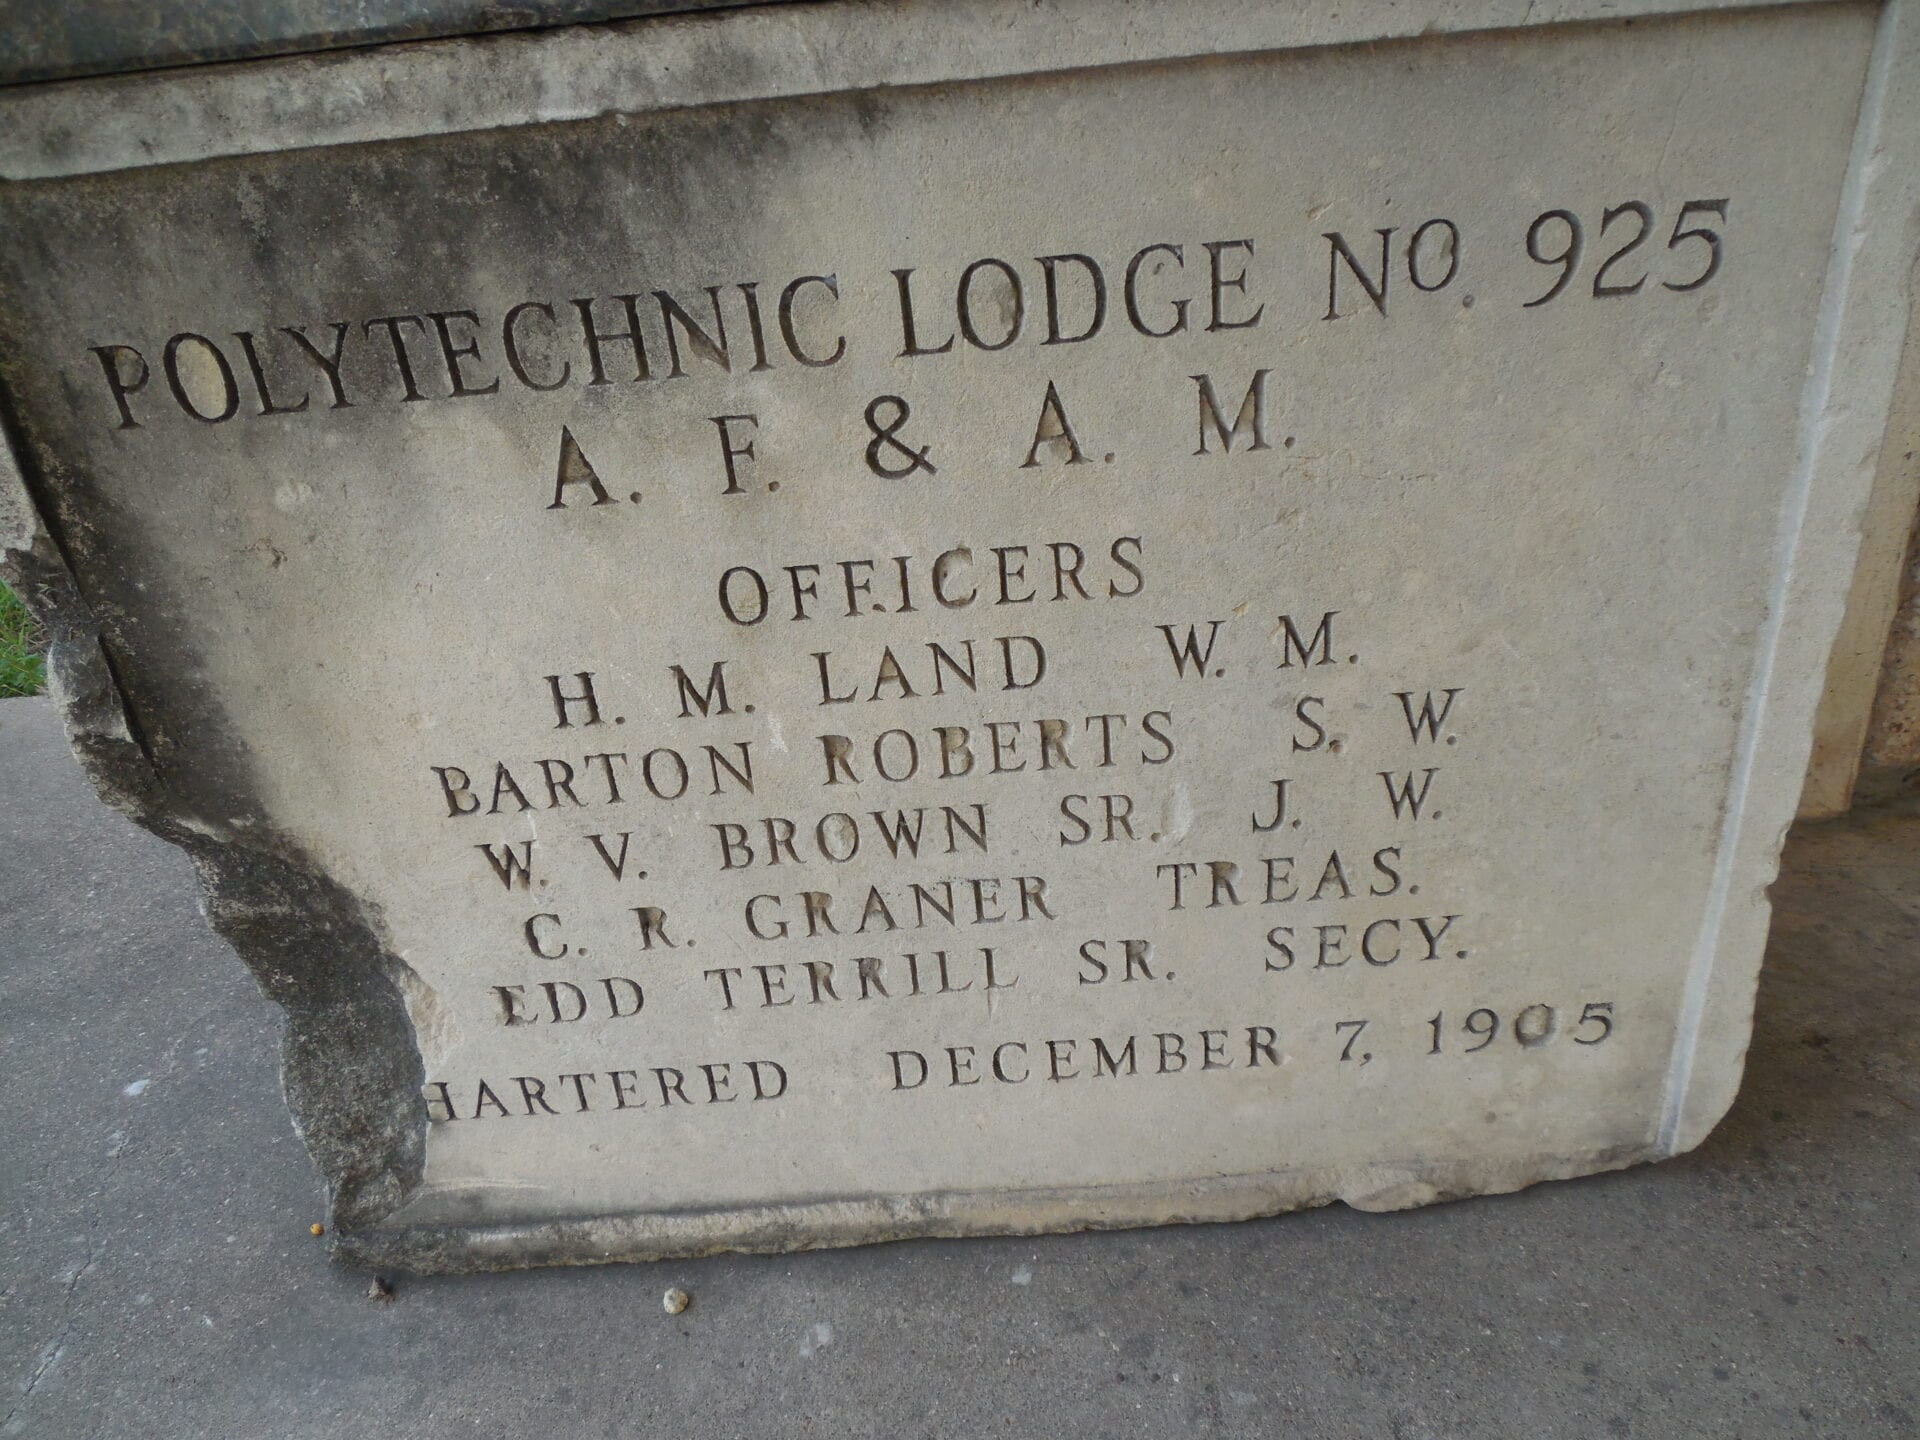 Southside Masonic Lodge #1114A.F.&A.M